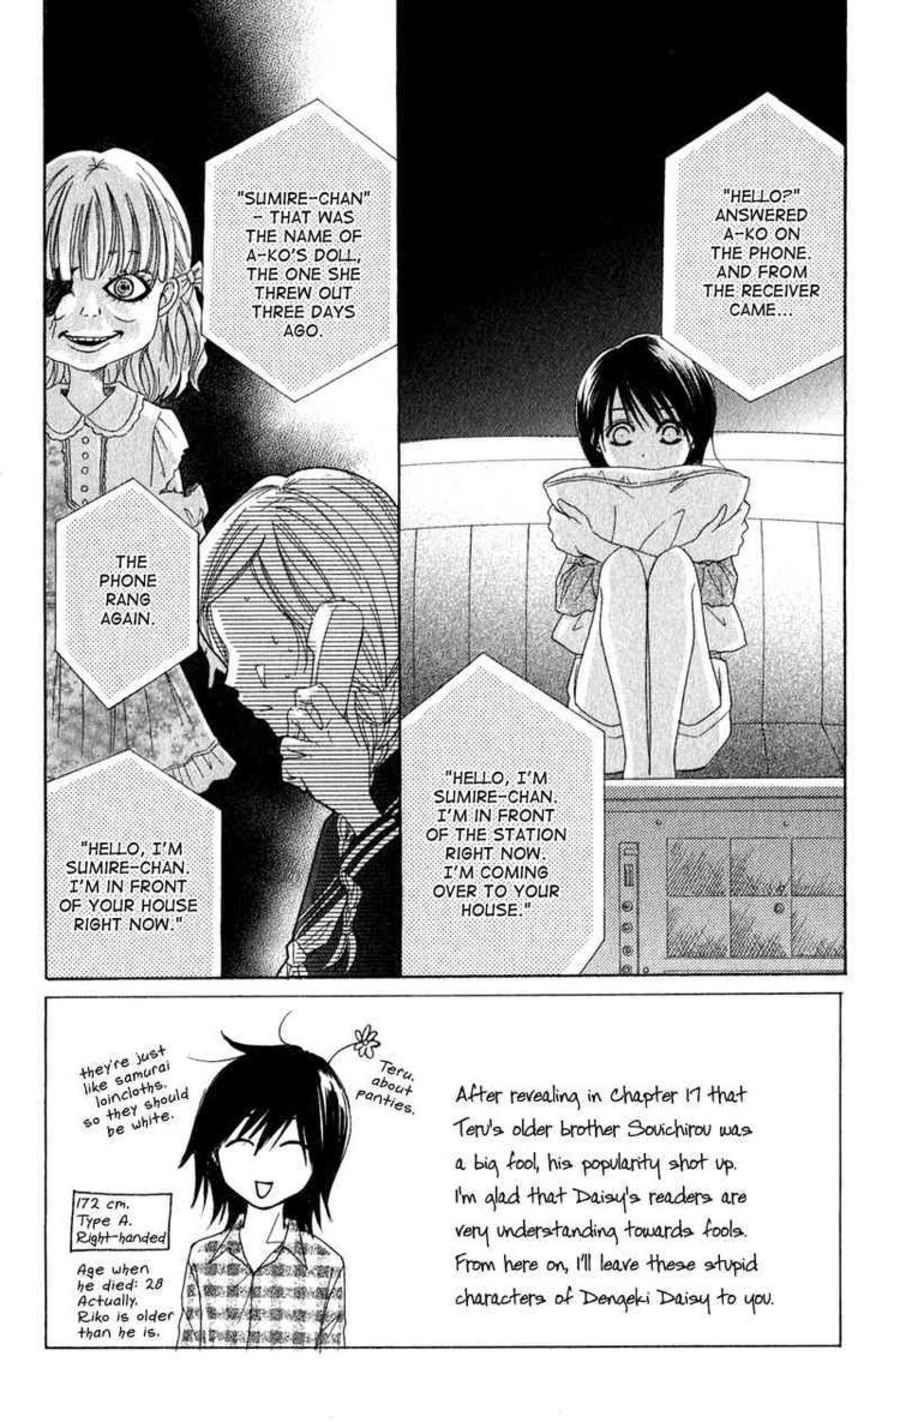 Dengeki Daisy Manga - Chapter 18 - Page 2 of 38 - AnimeA